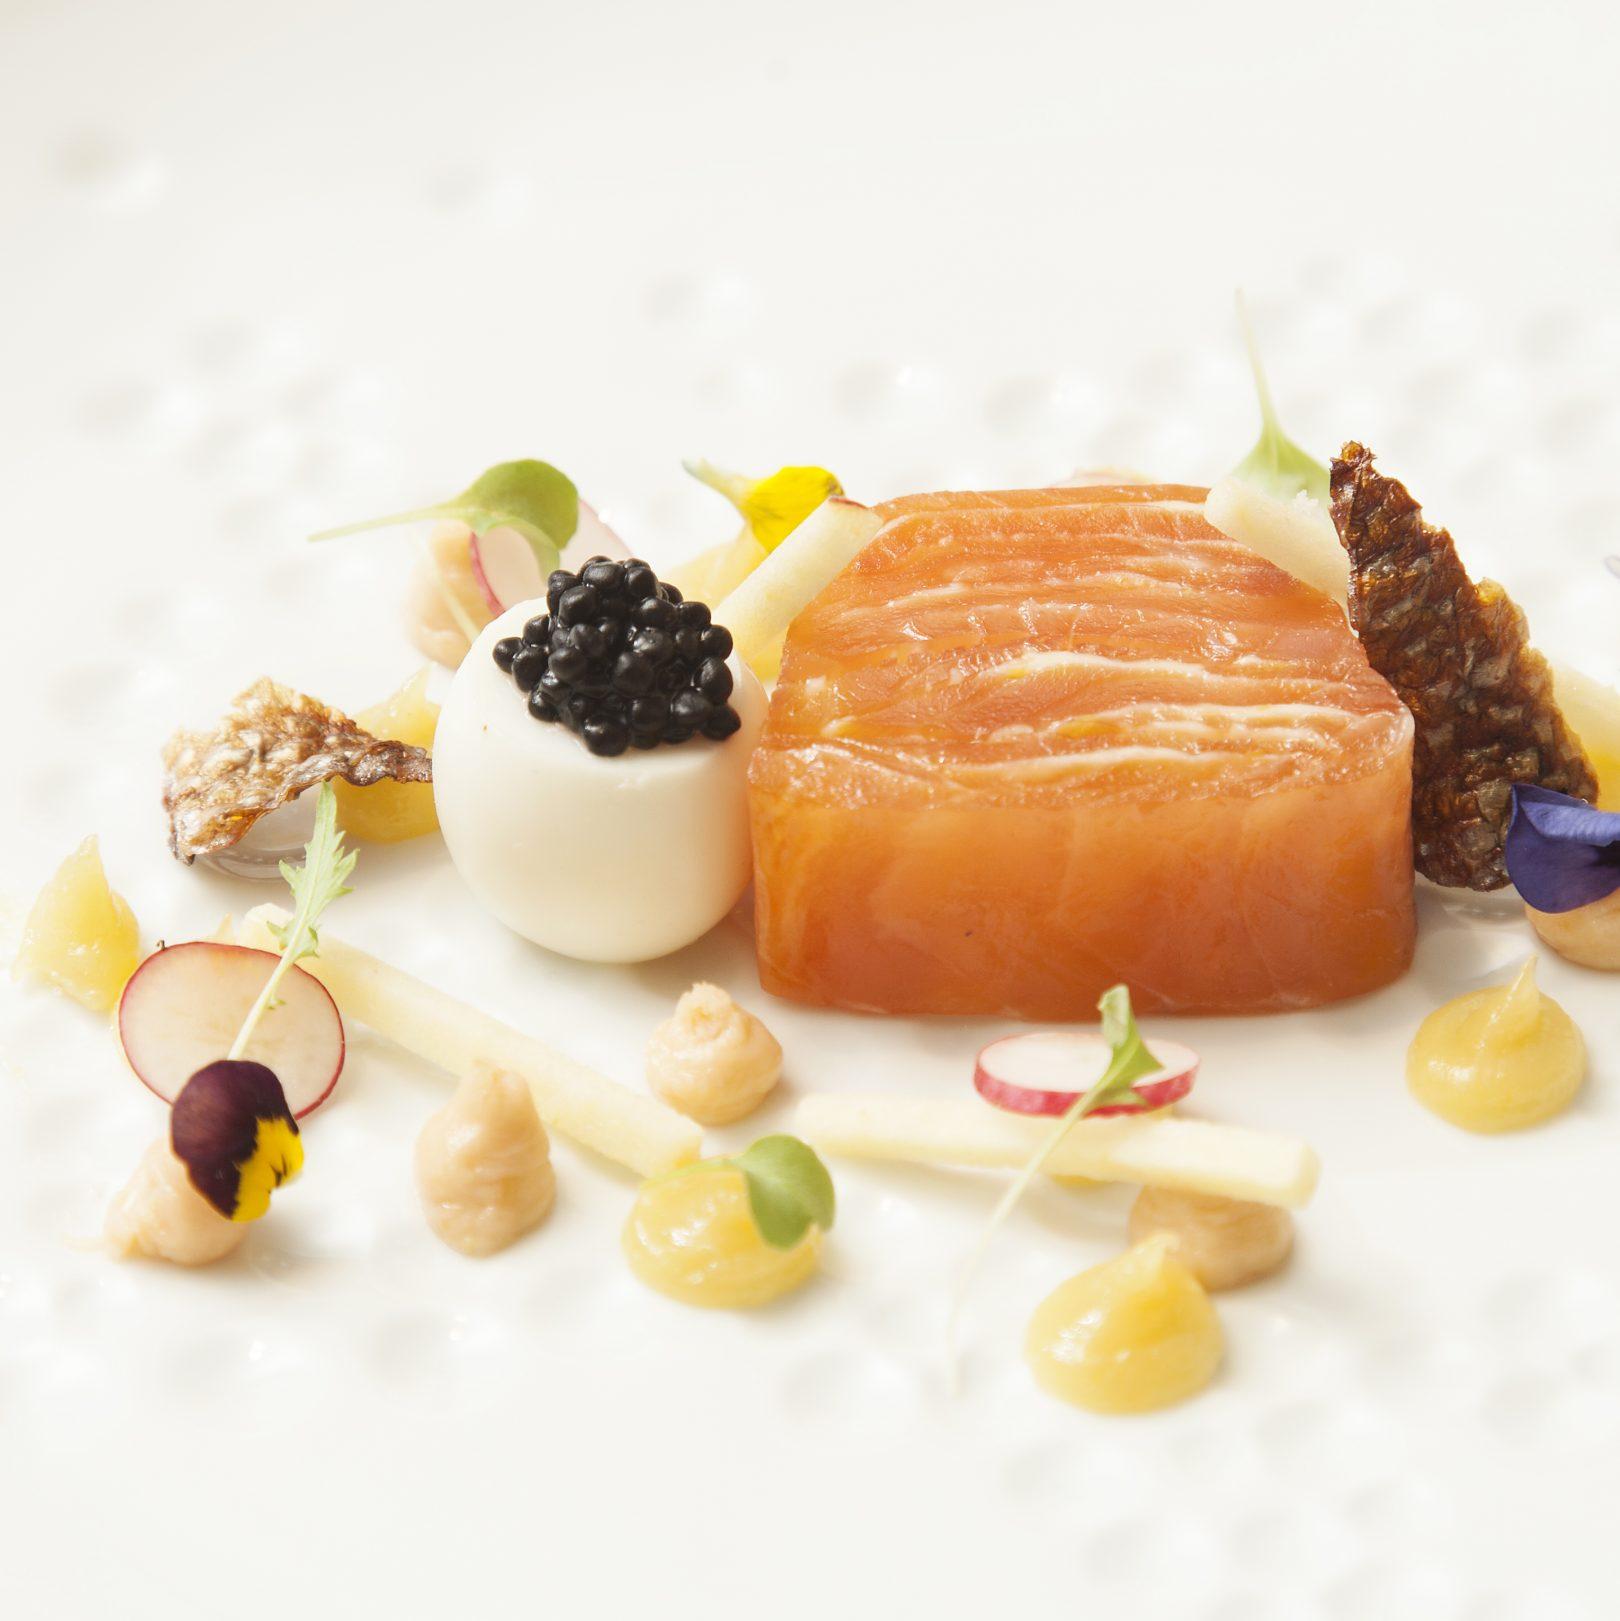 Number One smoked salmon, quails' egg, caviar